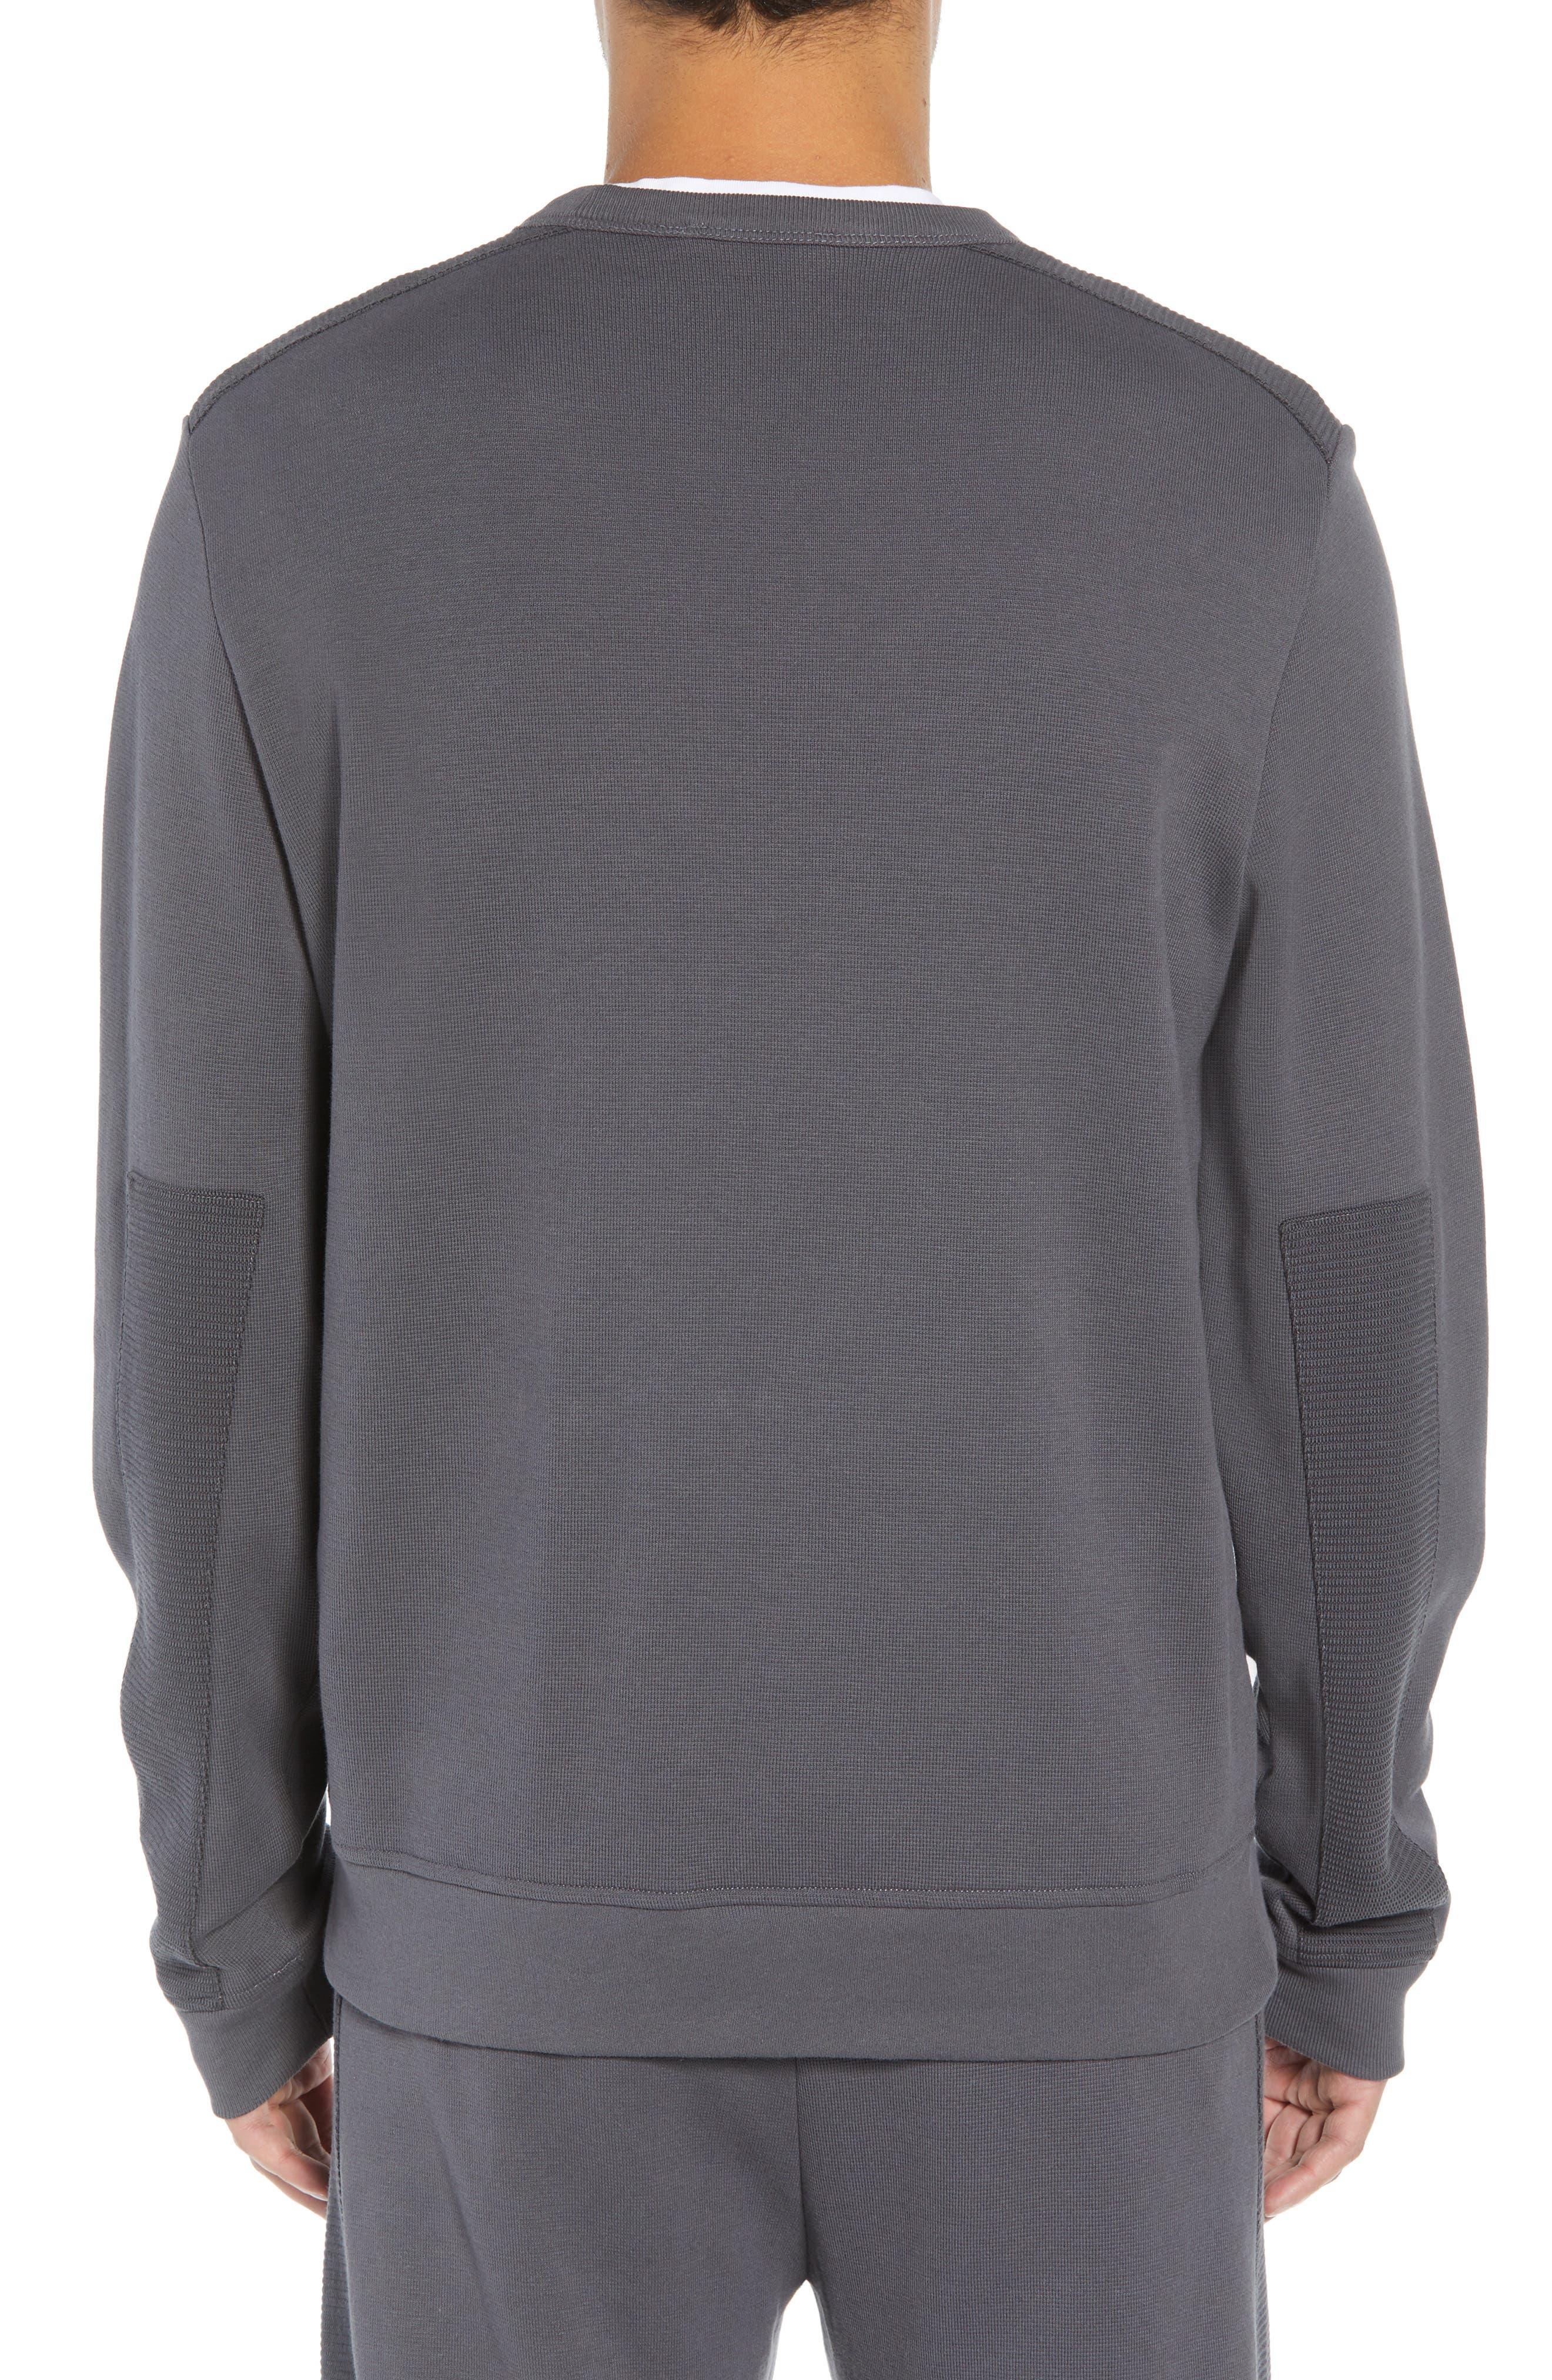 Ottoman Stitch Sweatshirt,                             Alternate thumbnail 2, color,                             SLATE